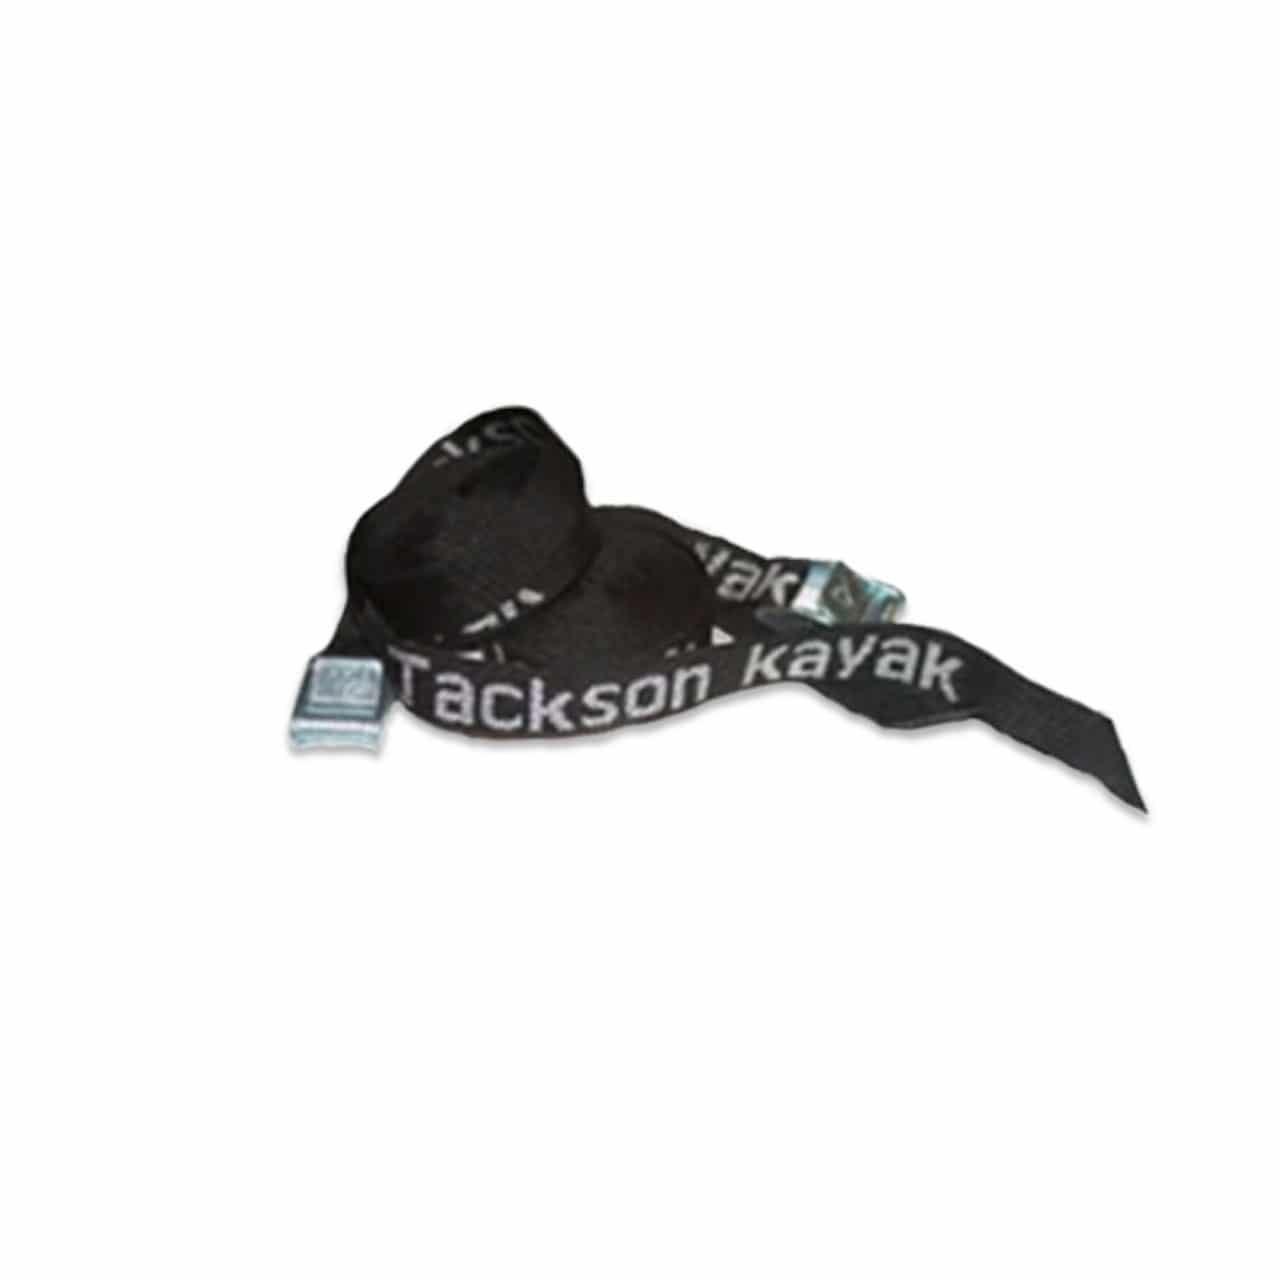 jackson kayak tie down straps